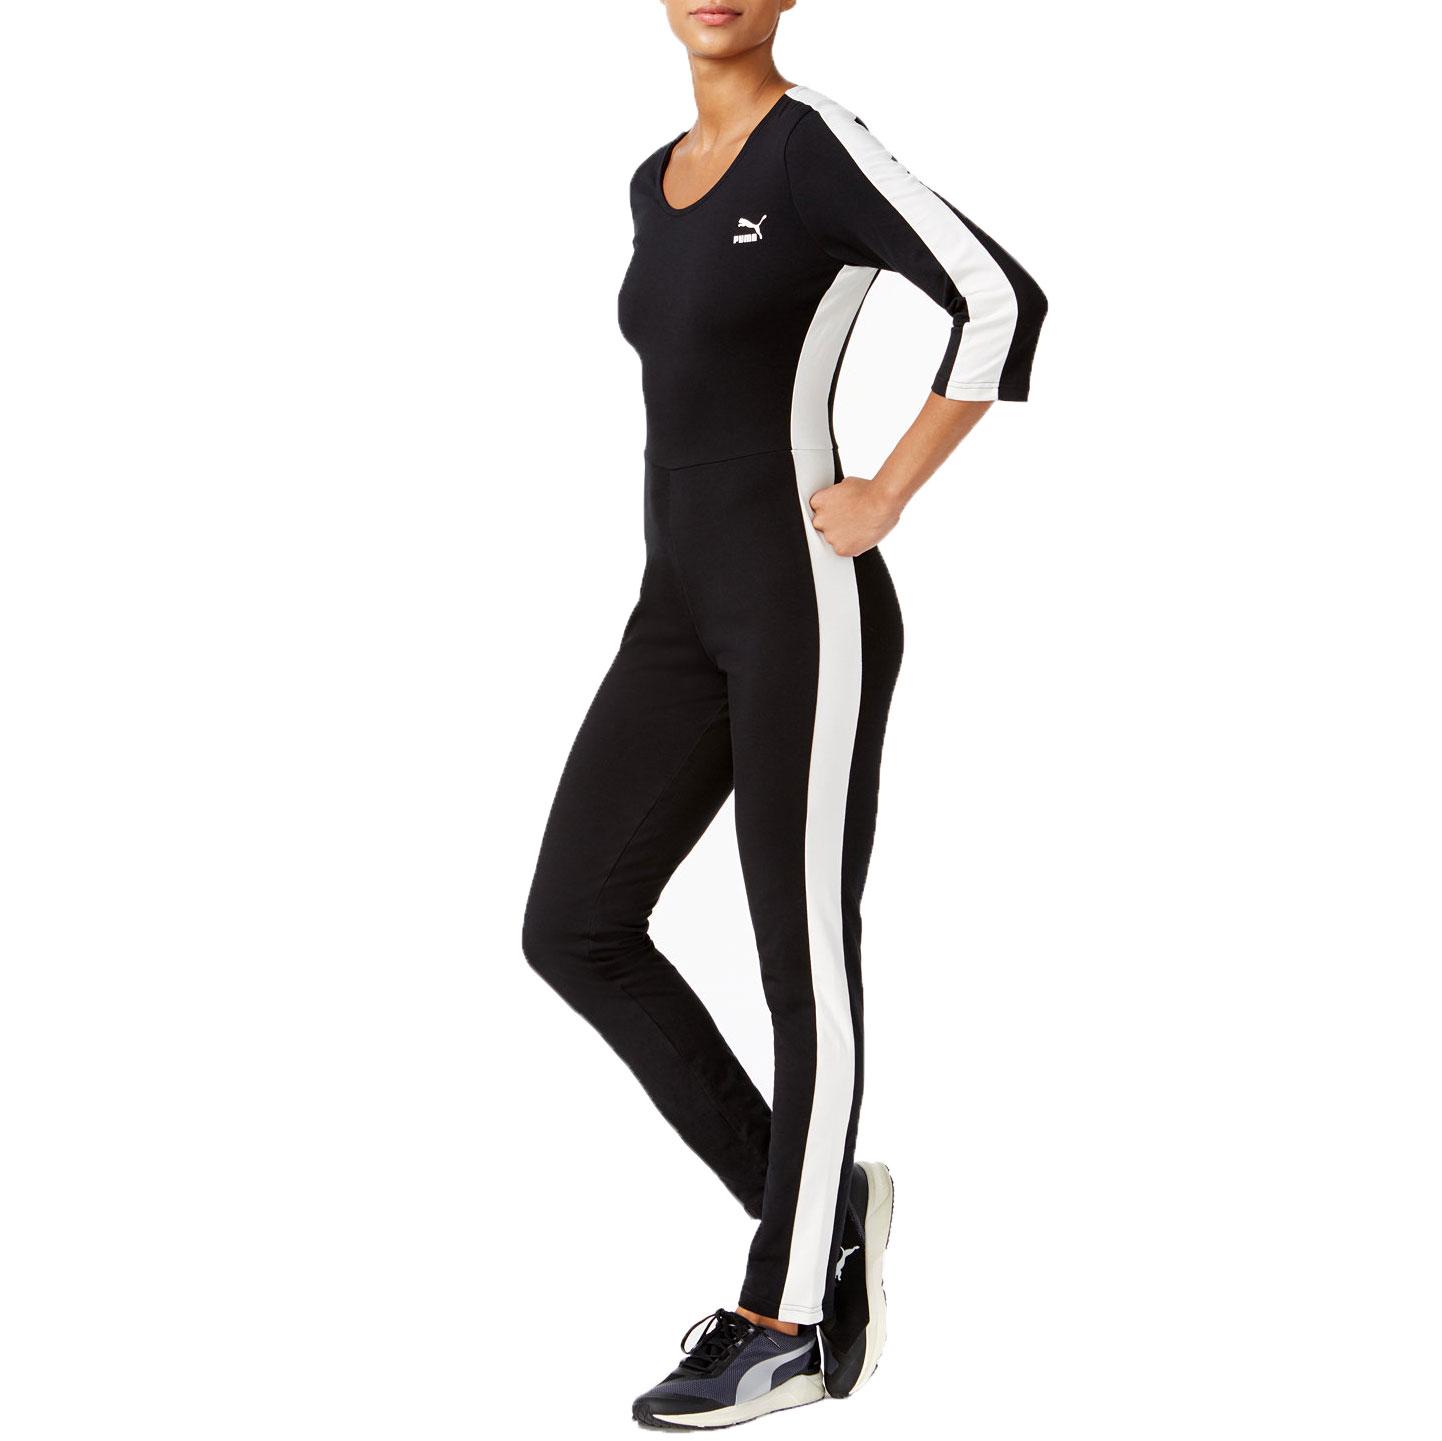 Puma T7 Women's 3/4 Sleeve Jumpsuit Black/White 573534-01